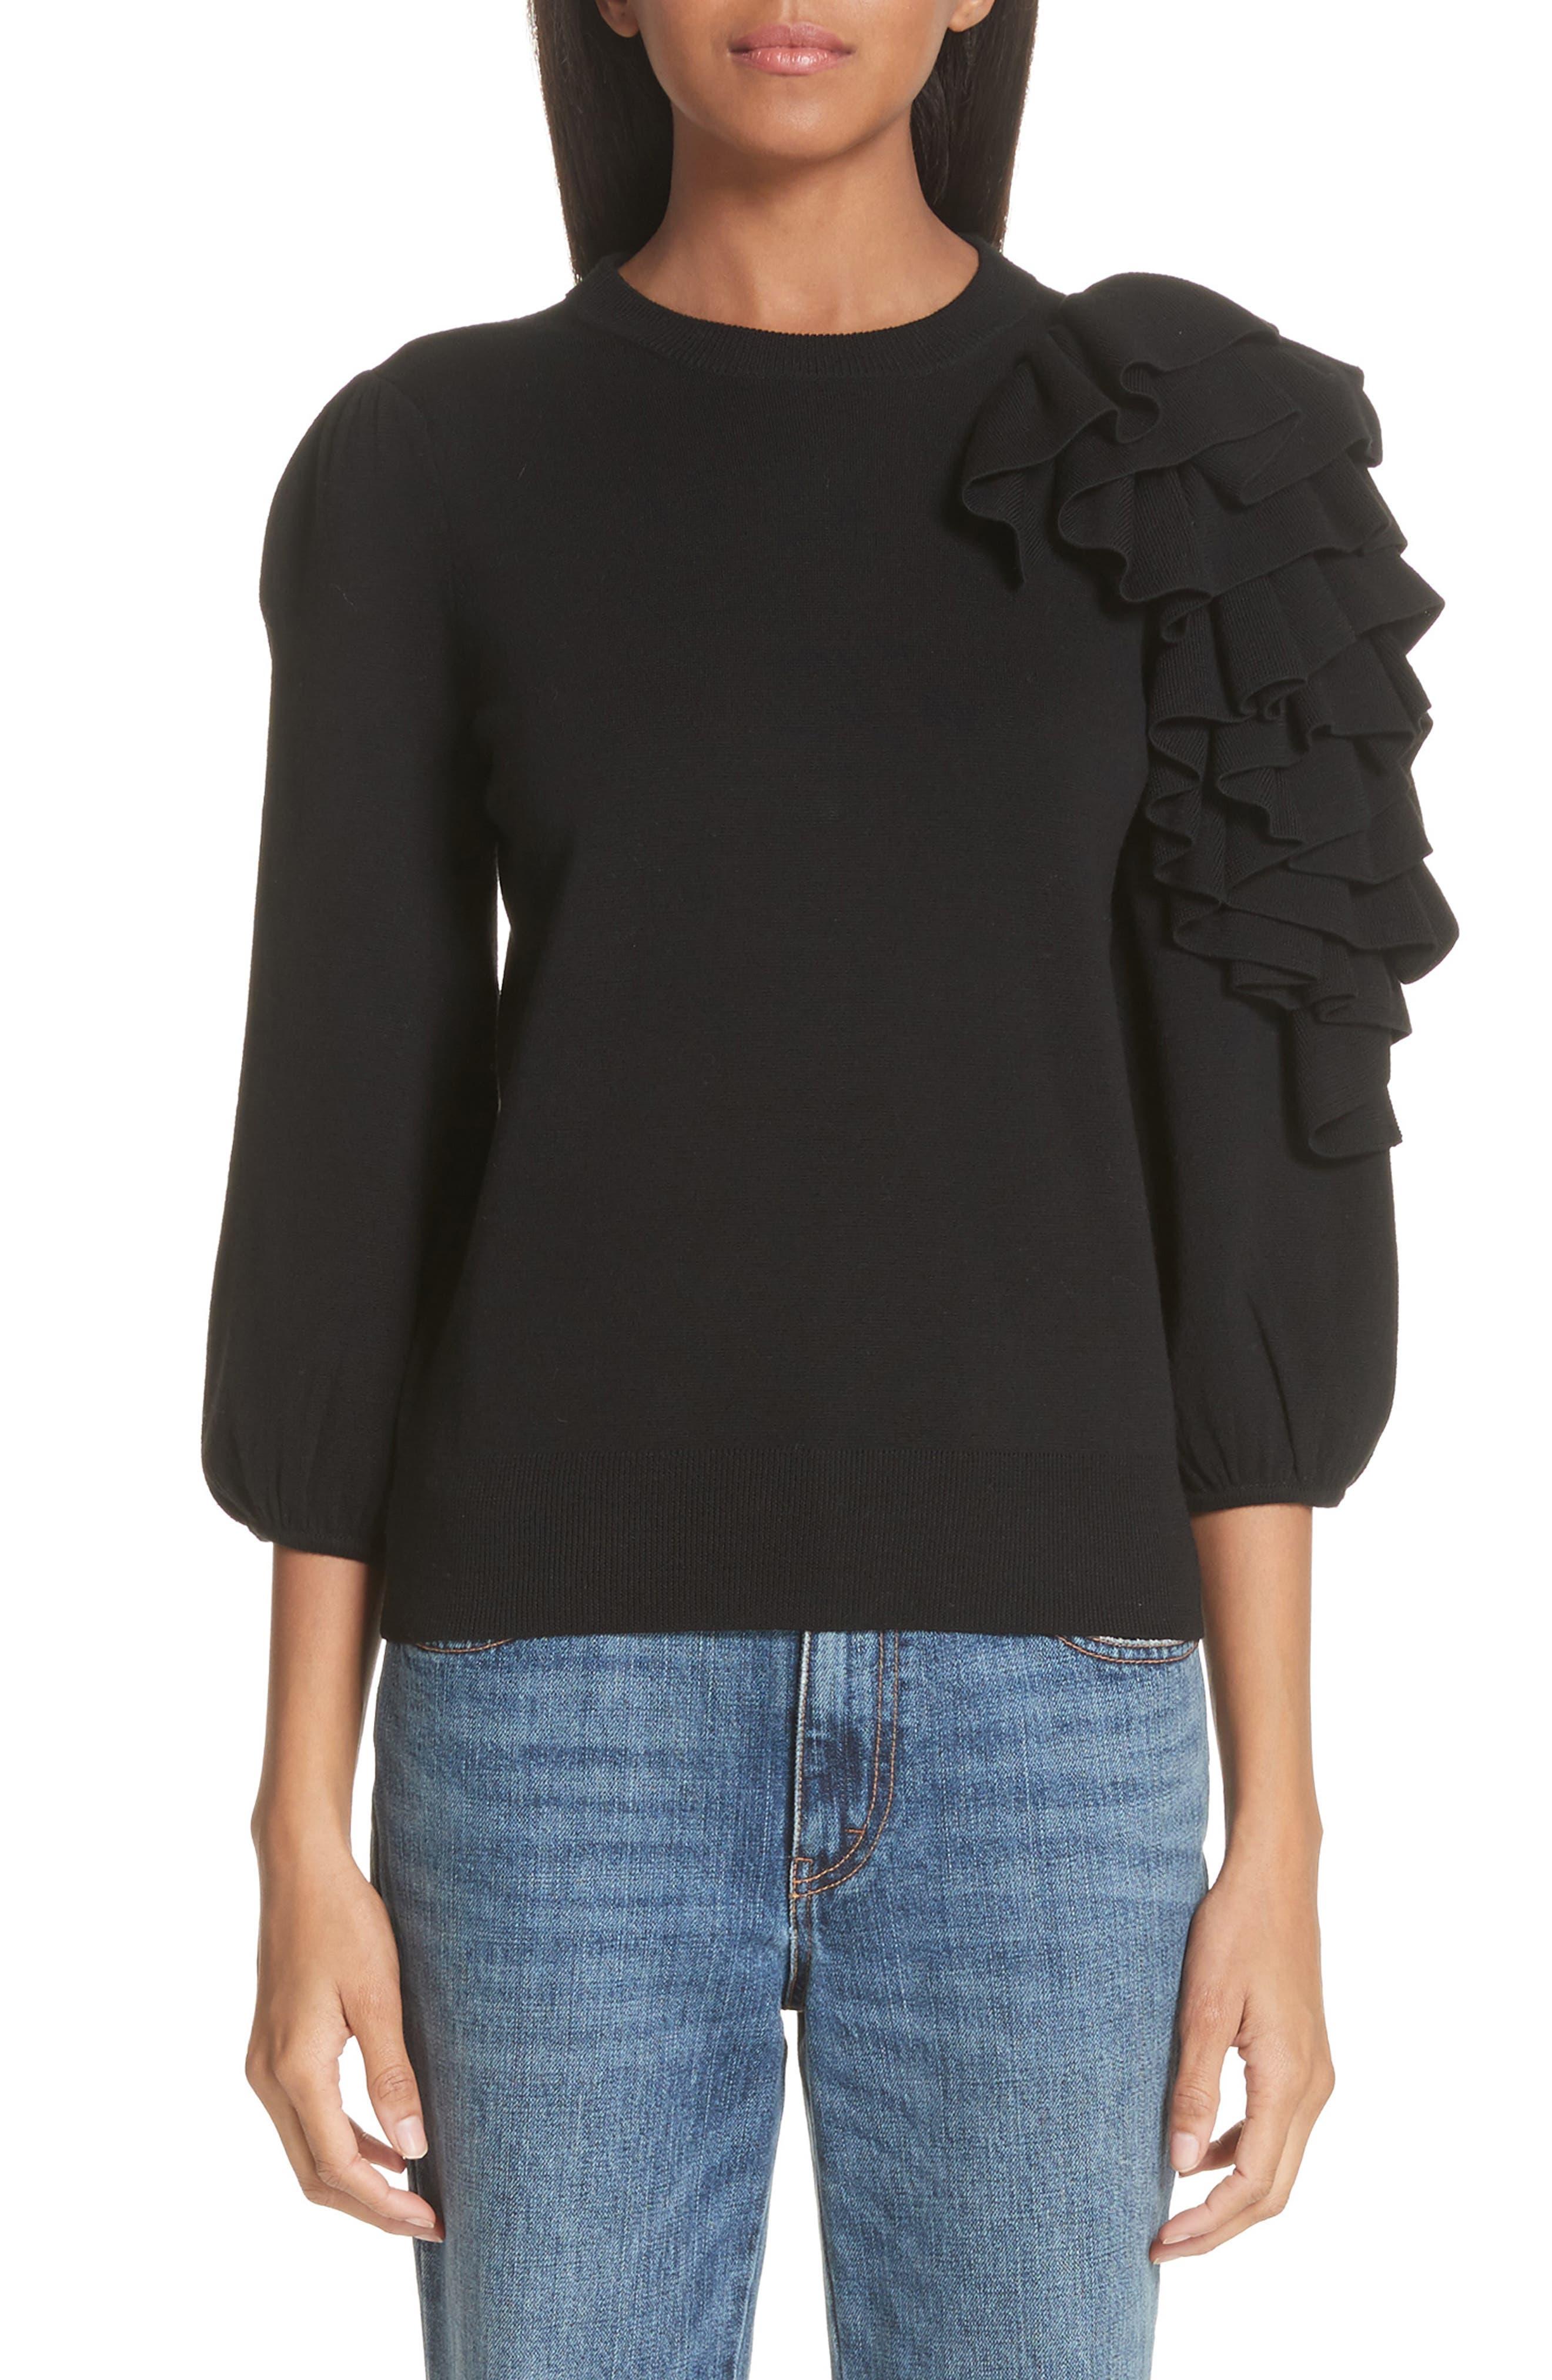 Co Ruffle Sleeve Merino Wool Sweater, Black